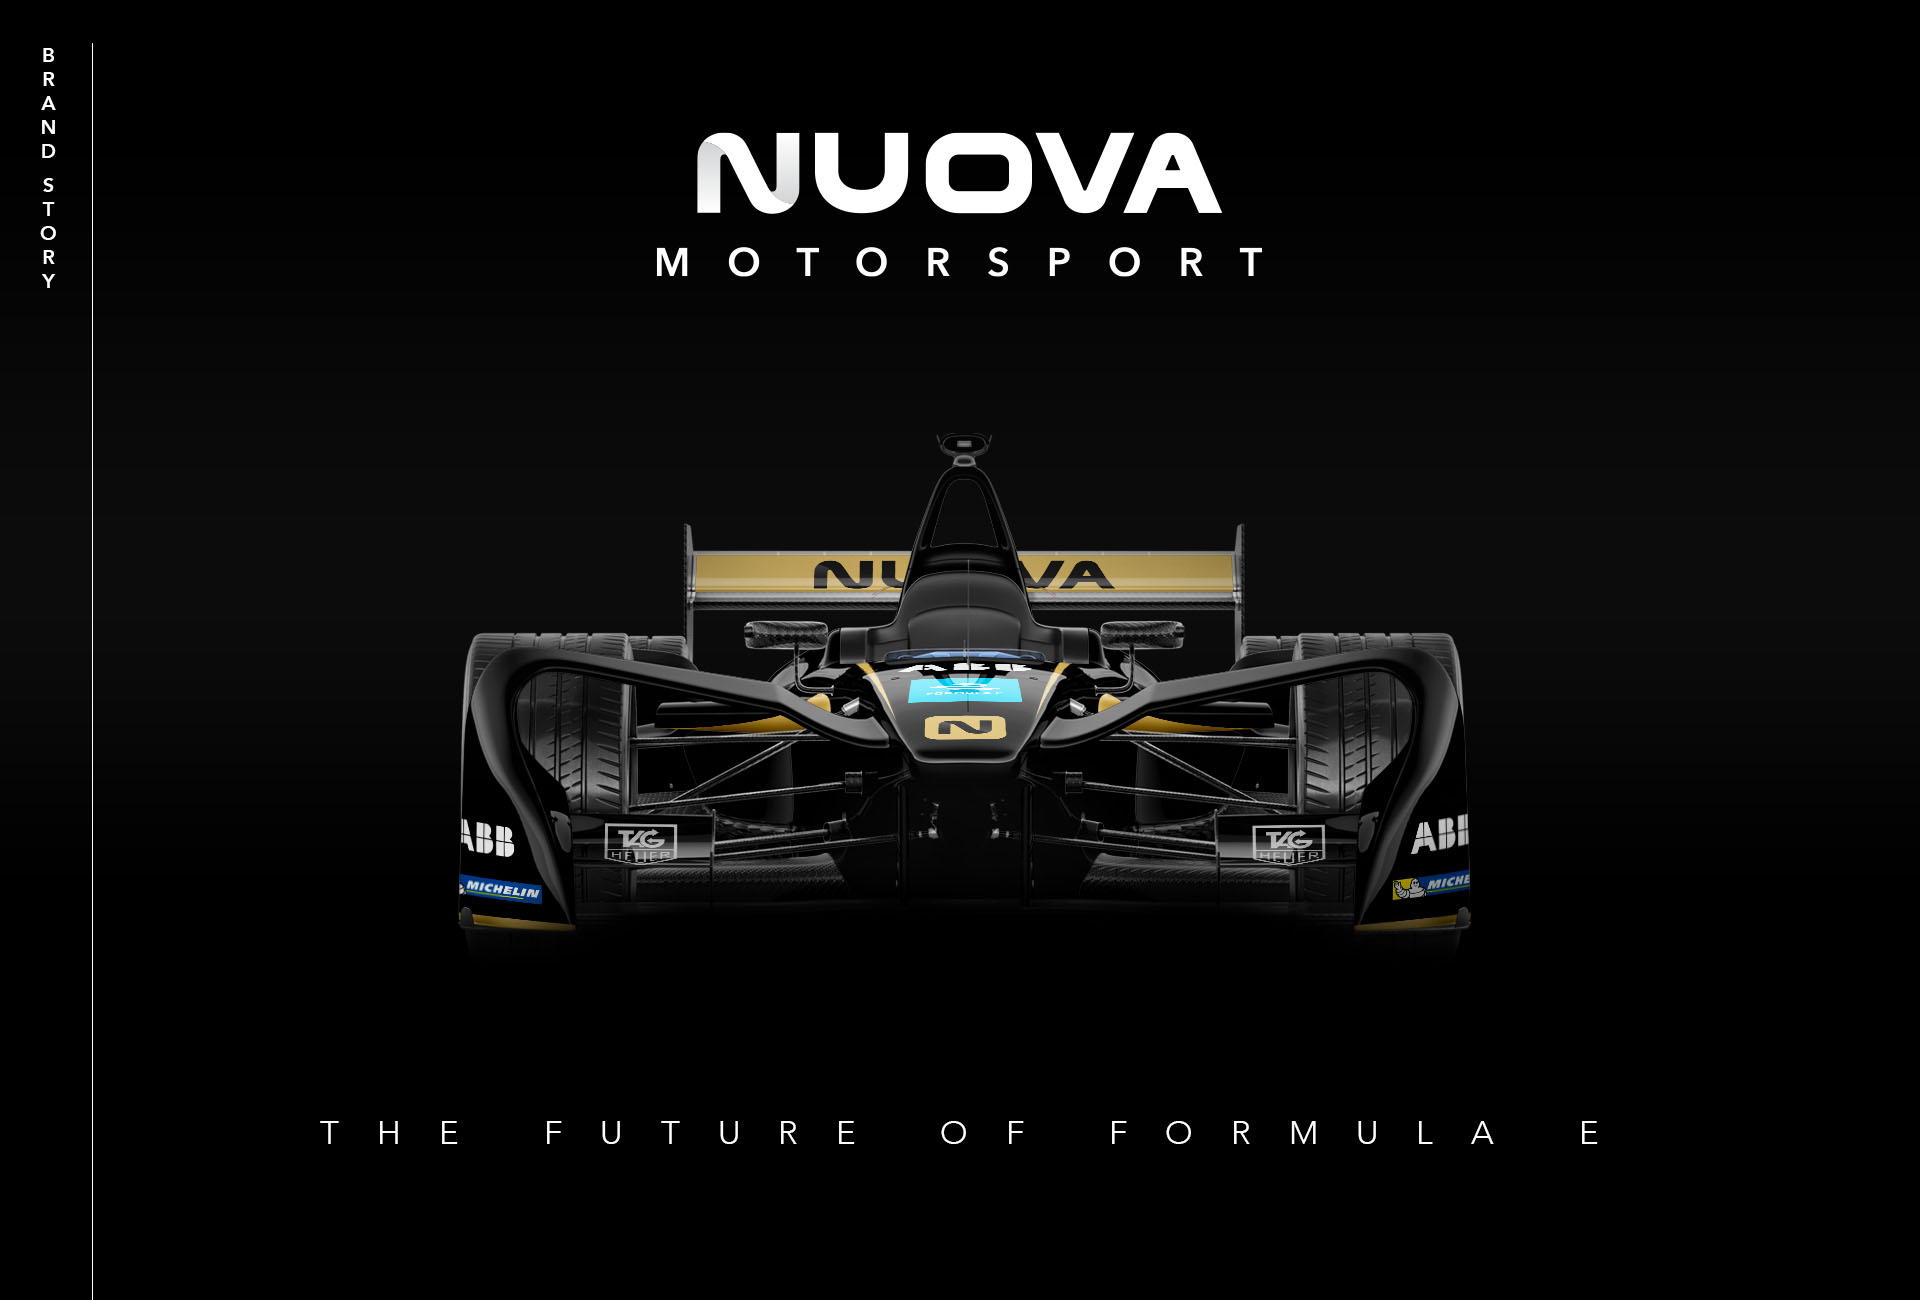 NUOVA Motorsport Brand Story